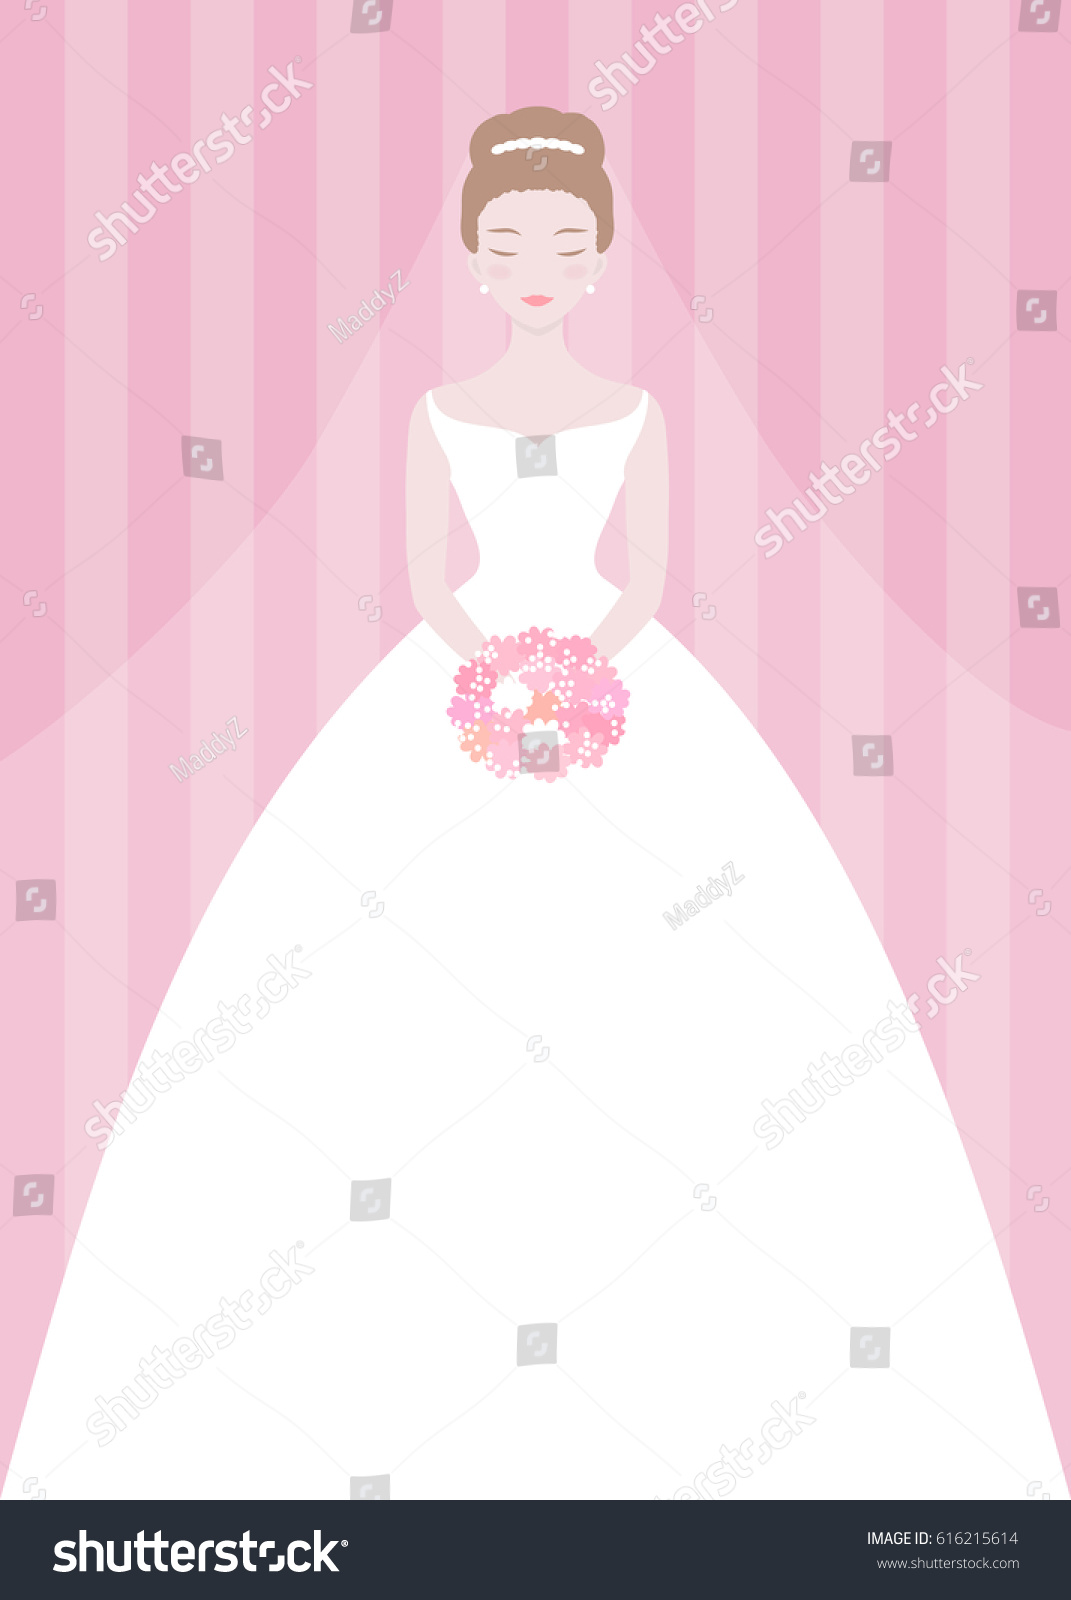 Bridal Shower Invitation Template Wedding Fashion Stock Vector ...